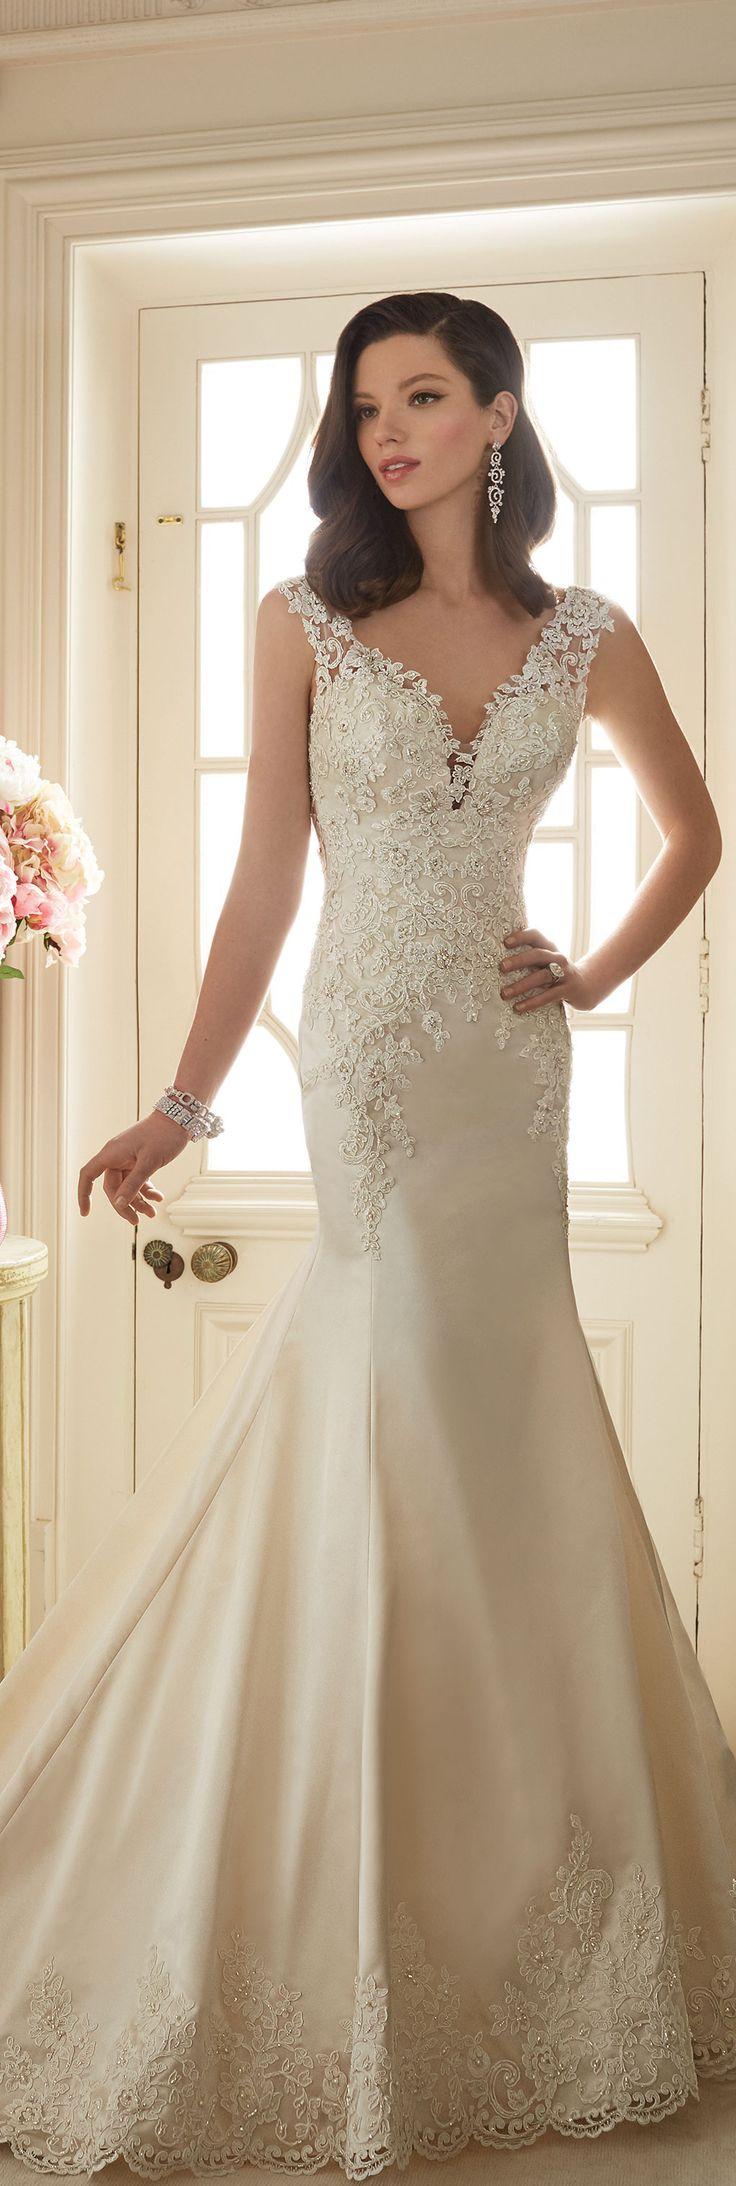 The Sophia Tolli Spring 2016 Wedding Dress Collection - Style No. Y11629 - Rexana #satinandlaceweddingdress